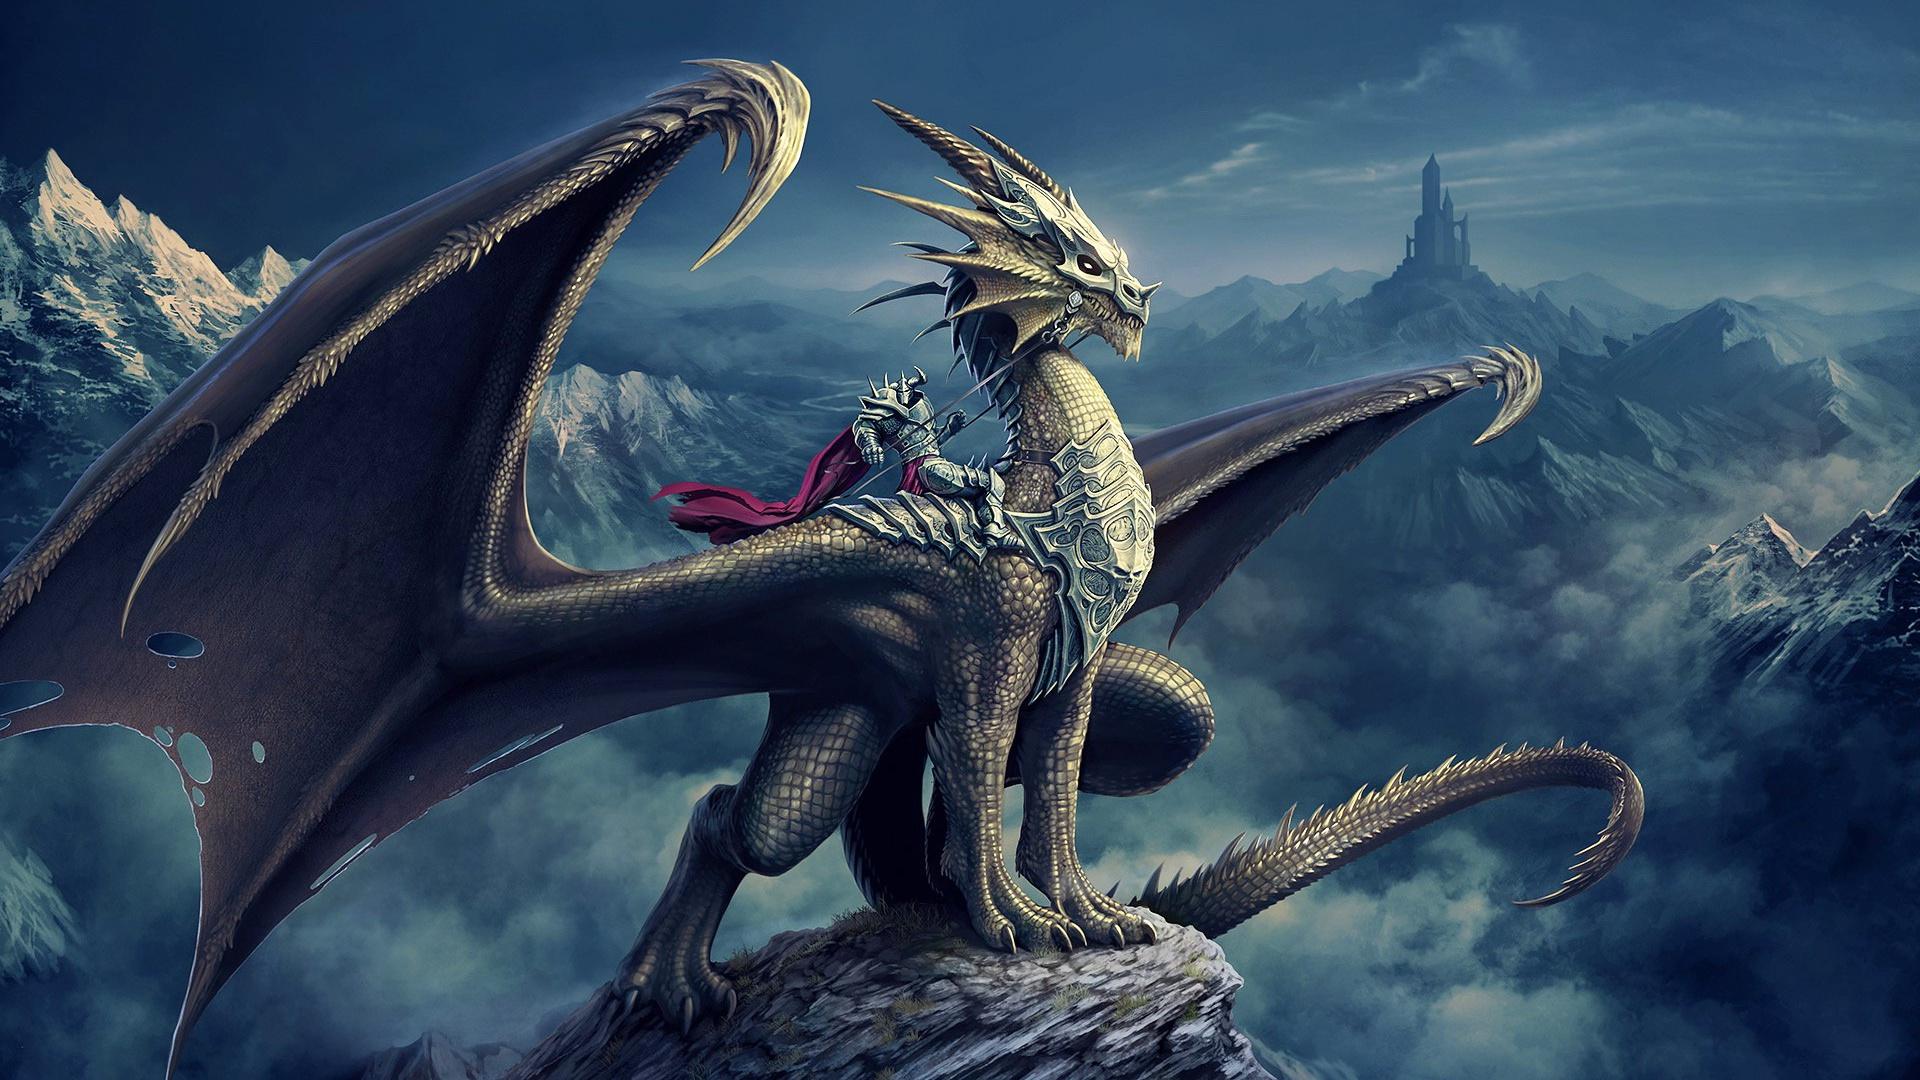 skyrim tags games skyrim dragons fantasy dragonborn how to set 1920x1080